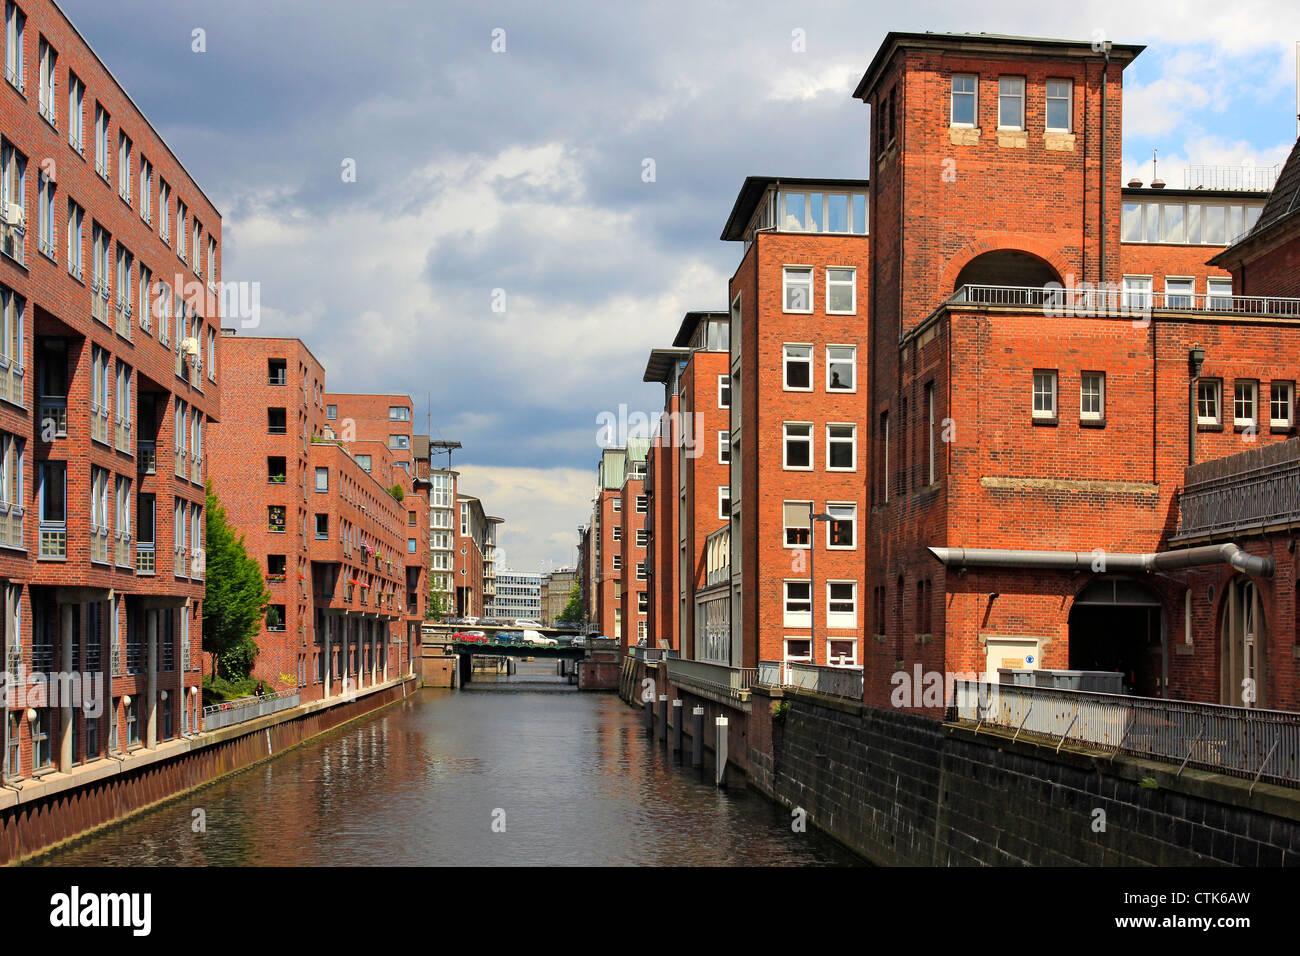 Germany, Hanseatic City Hamburg, Brick building on the Herrengrabenfleet - Stock Image